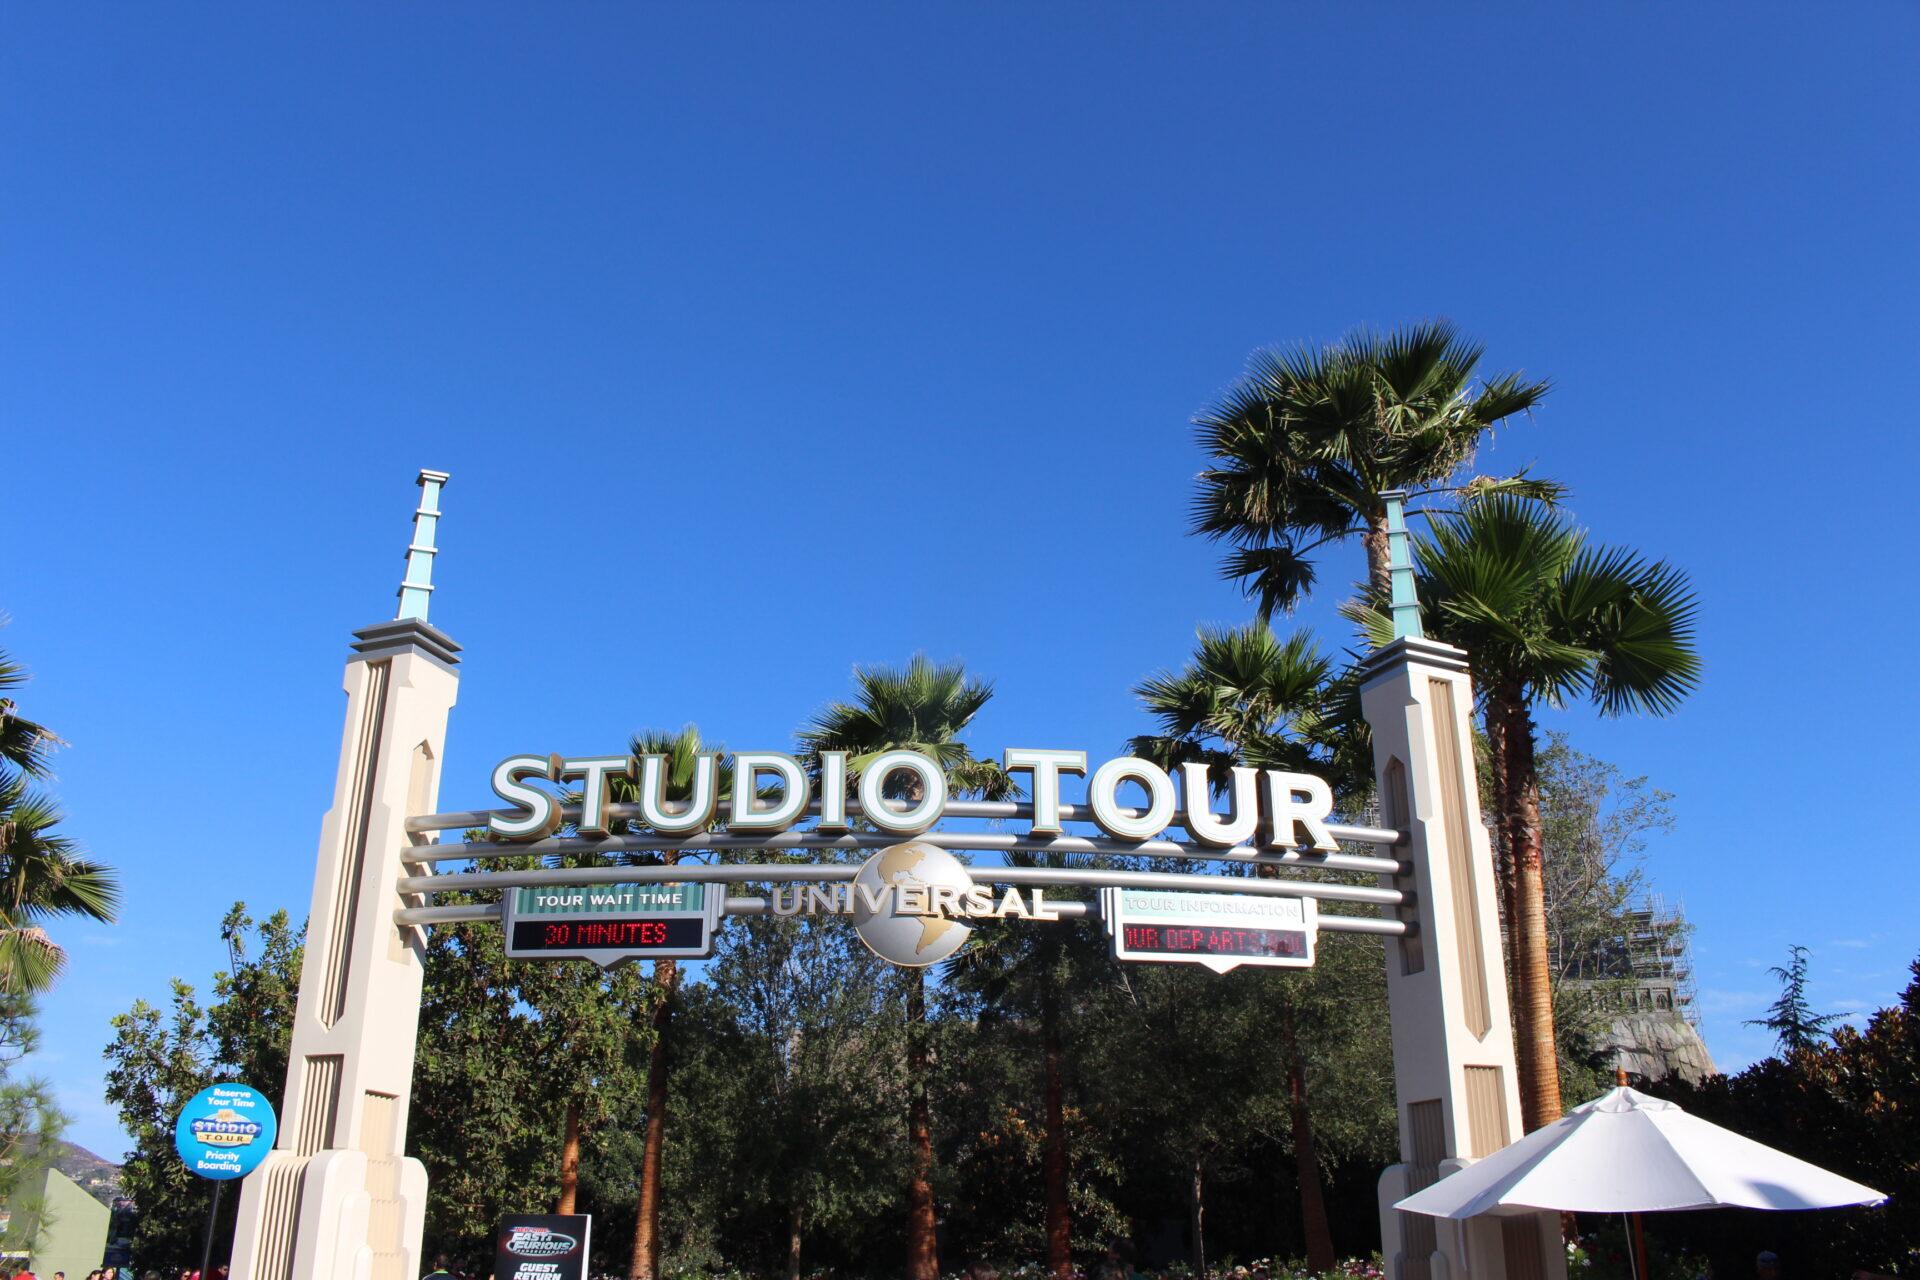 Studio Tour - Universal Studios Hollywood